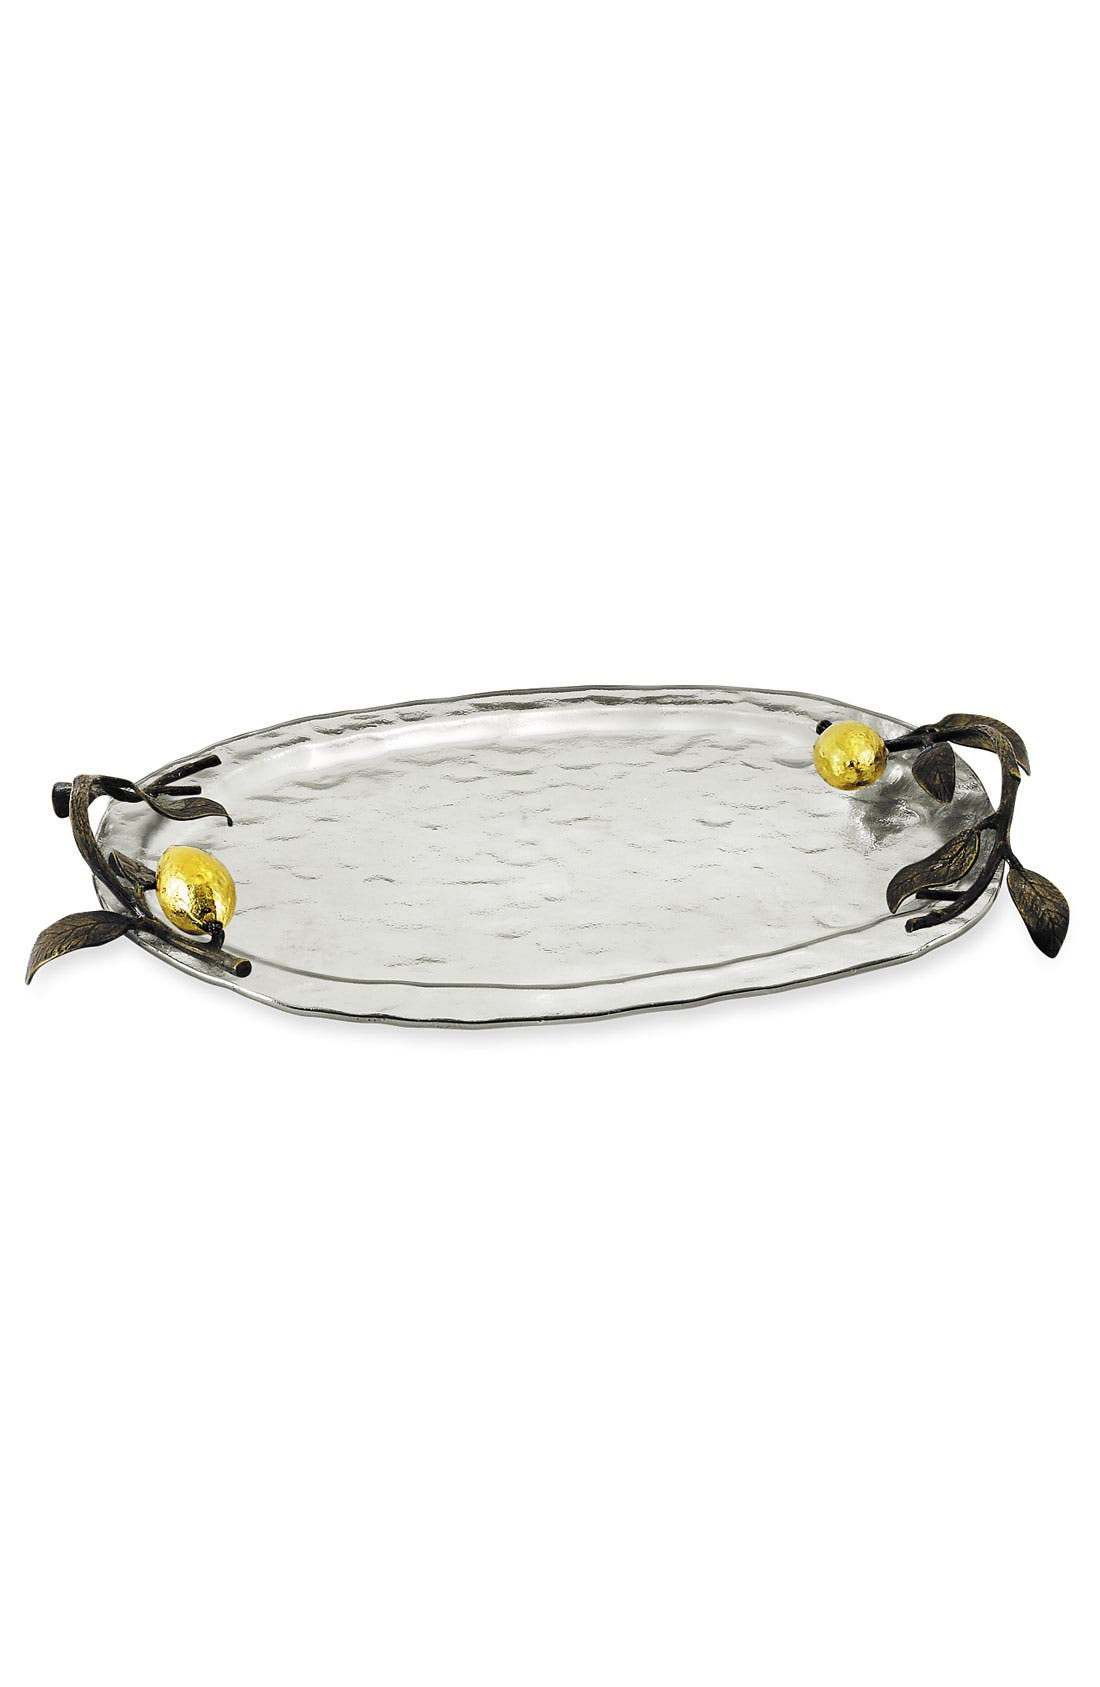 'Lemonwood' Plated Glass Tray,                             Main thumbnail 1, color,                             047